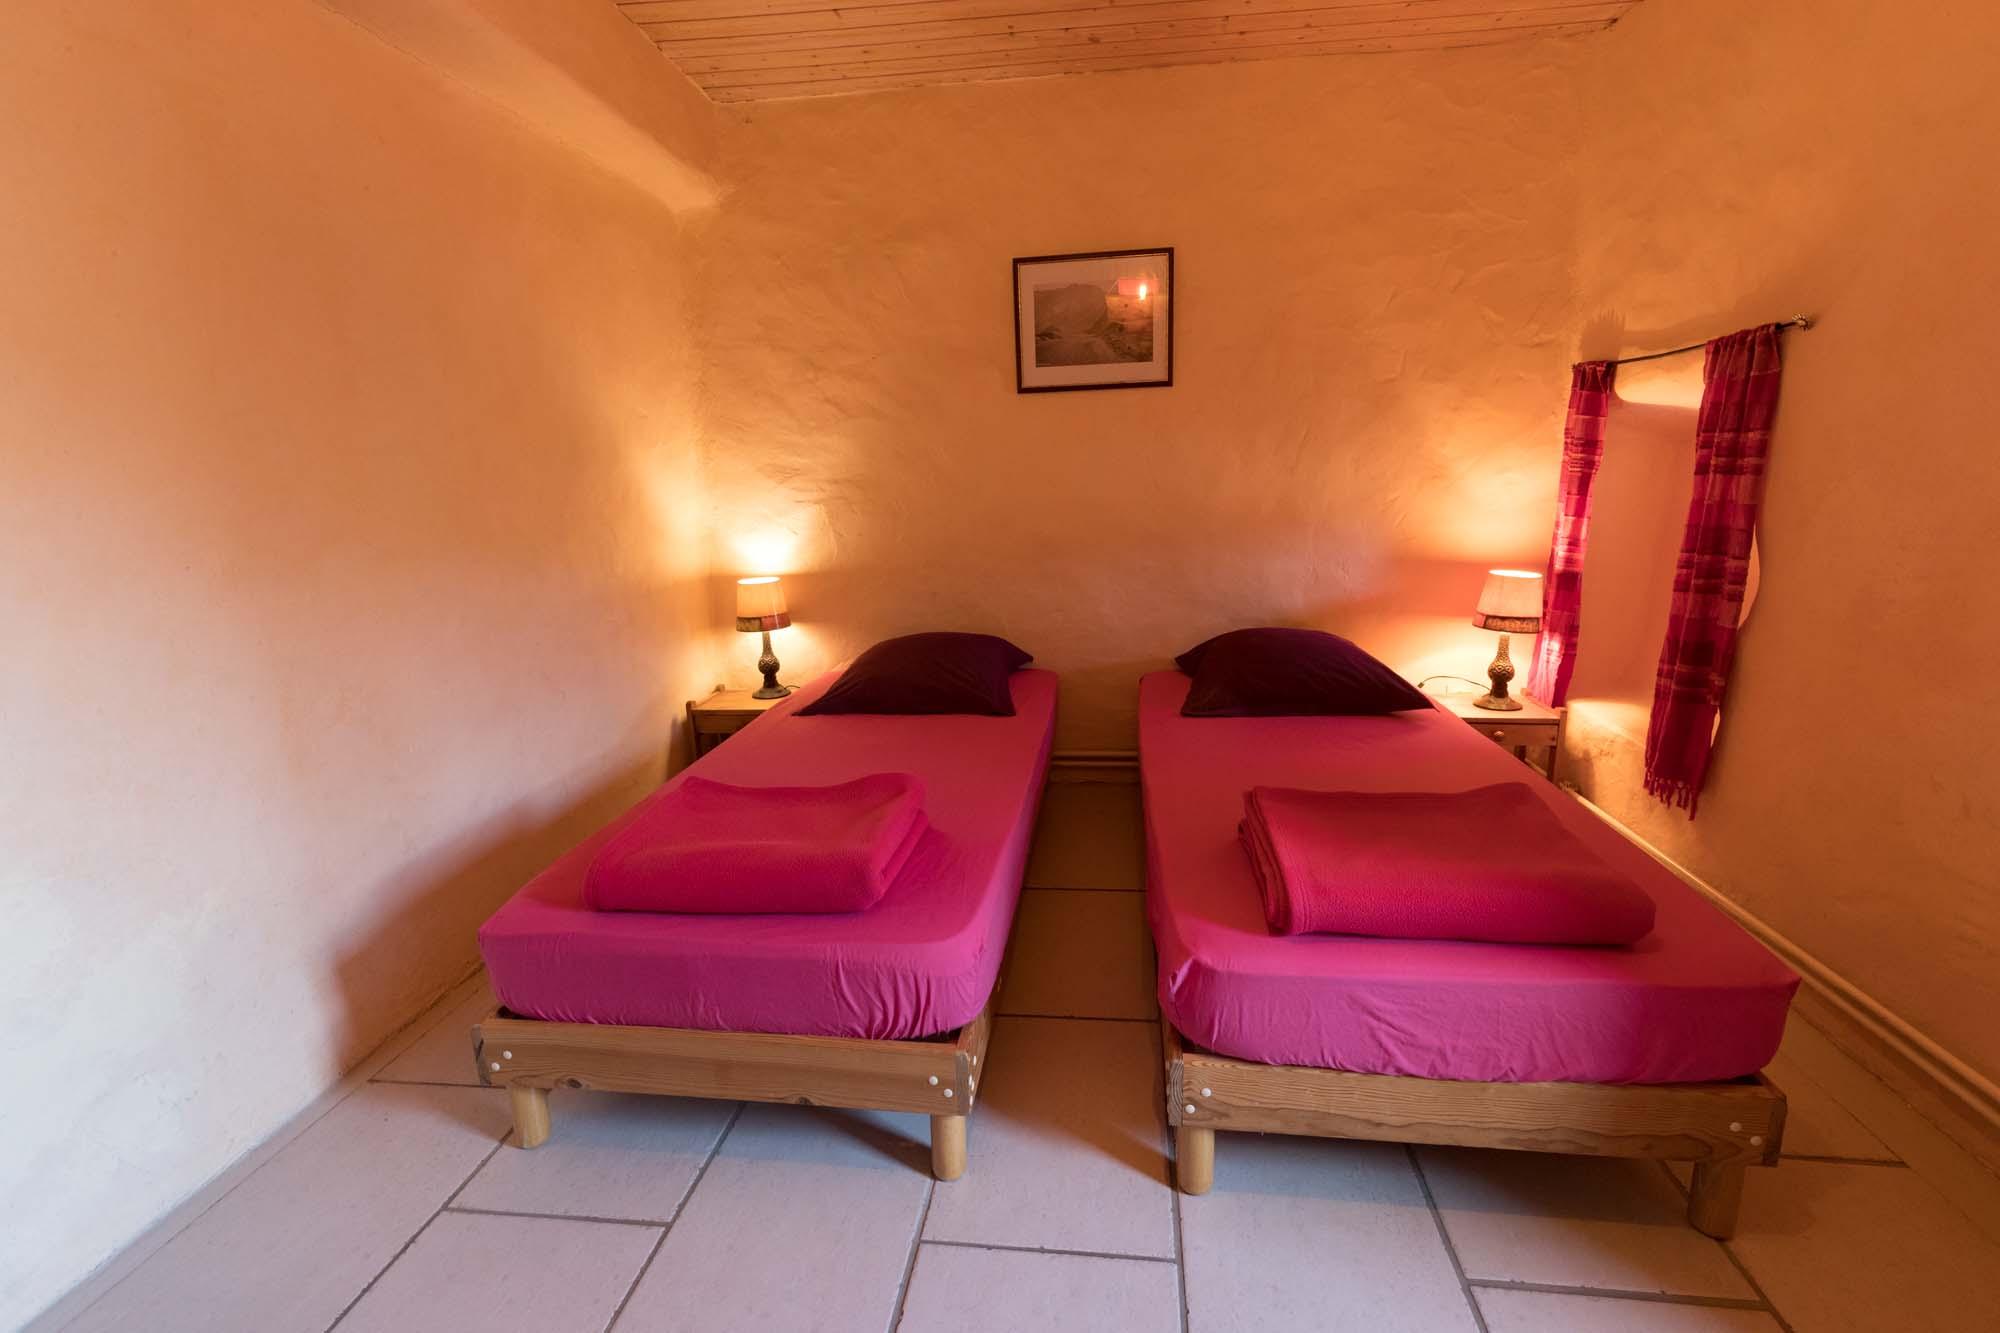 La chambre 4 lits